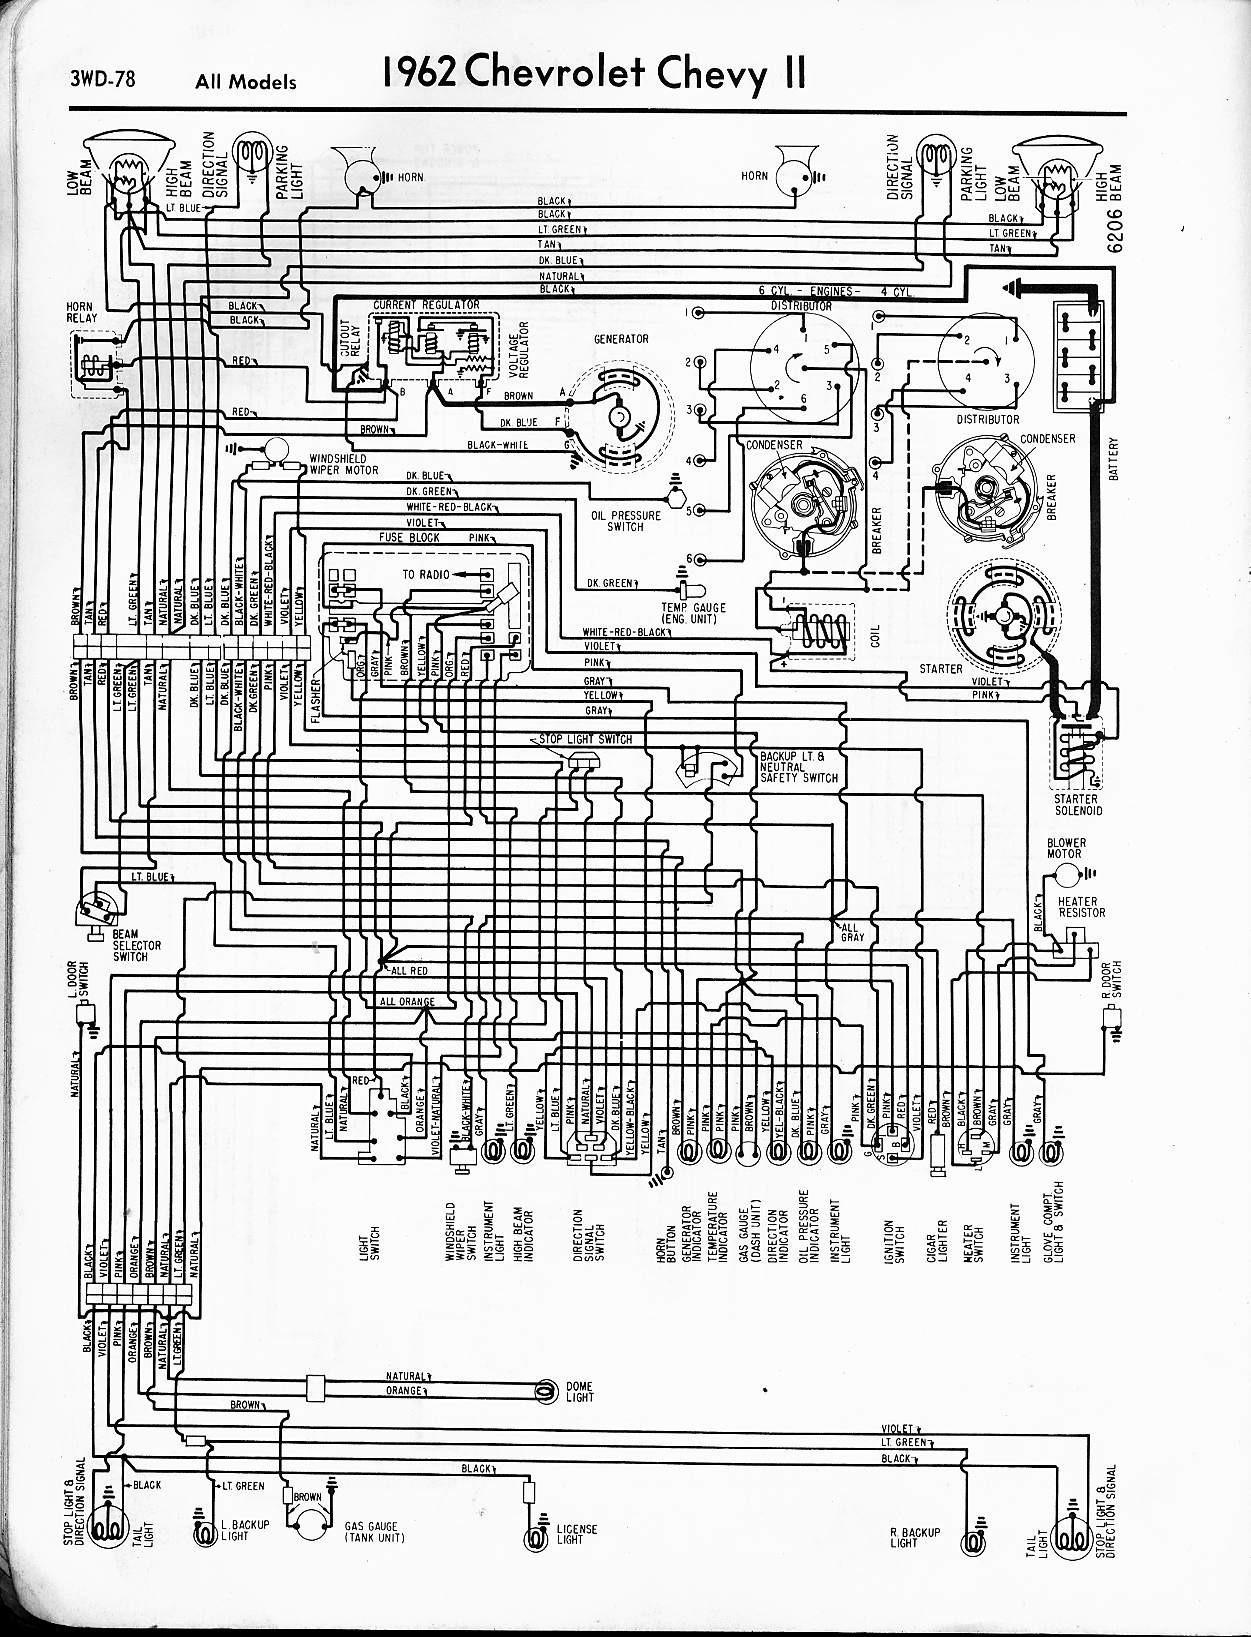 1967 firebird shifter wiring diagram 1967 circuit diagrams wire rh abetter pw 1994 Pontiac Firebird Wiring Diagram 1968 Firebird Wiring Diagram